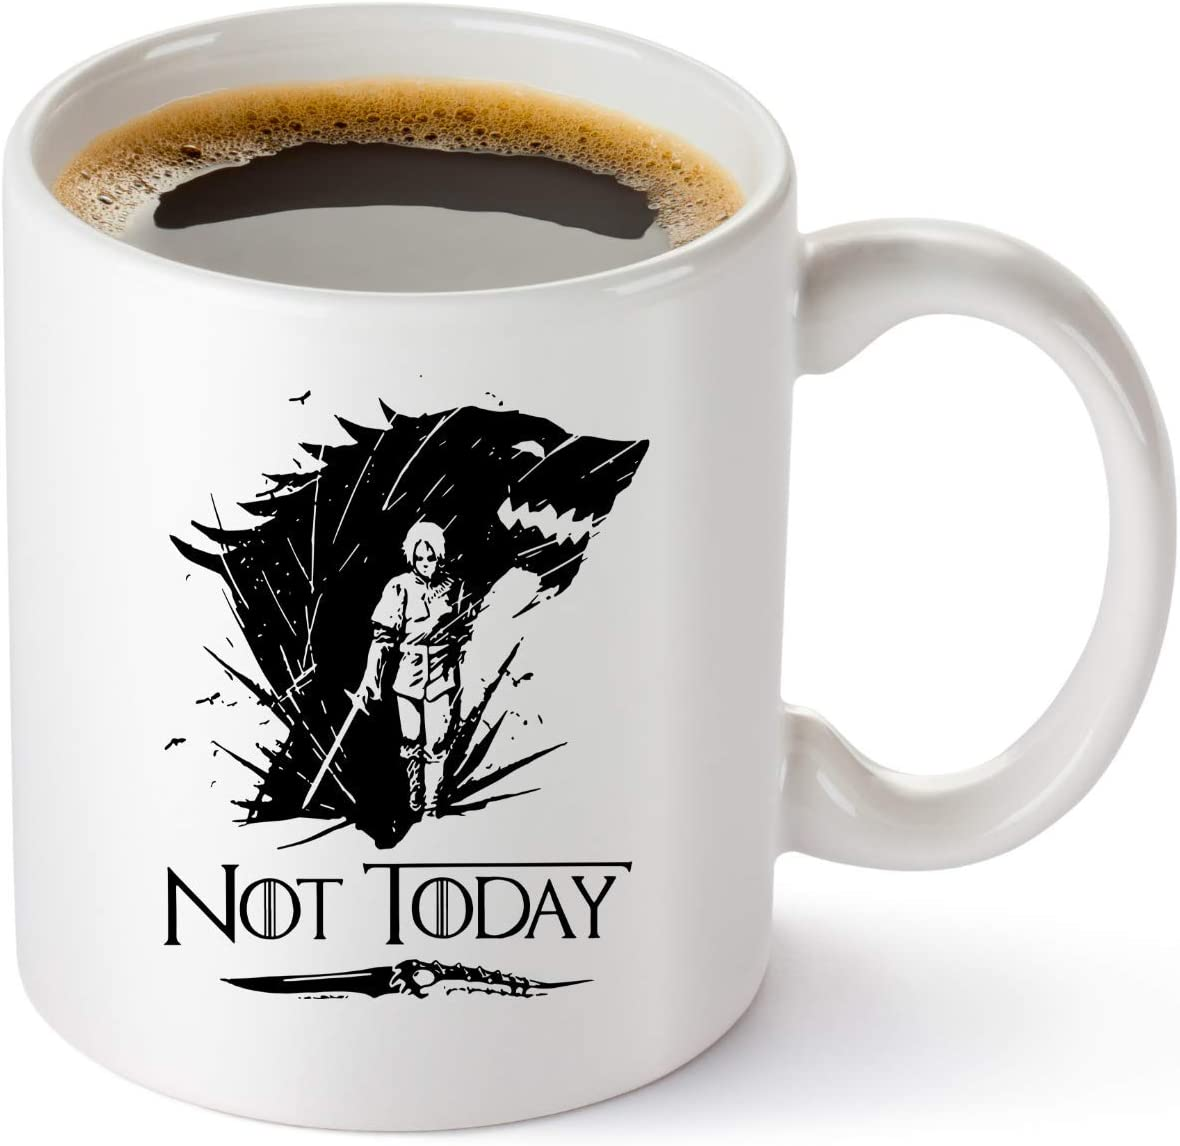 Game Of Thrones Merchandise Mug Not Today Coffee Mug Arya Stark GOT Cup Funny Birthday Gifts For Women And Men House Stark